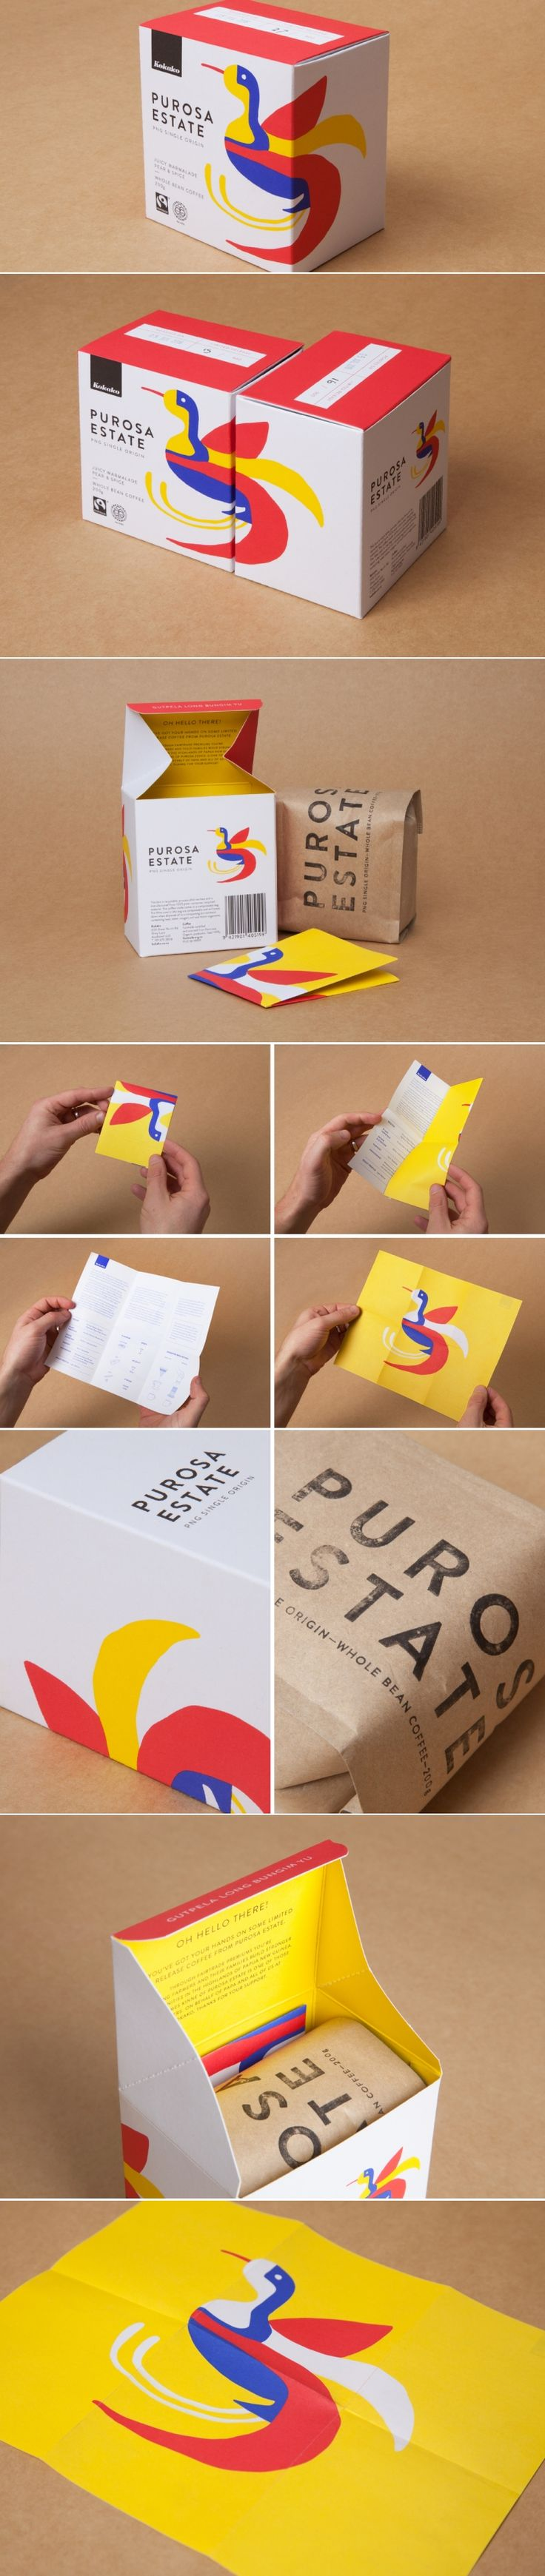 Kokako – Purosa Estate Single Origin — The Dieline | Packaging & Branding Design & Innovation News